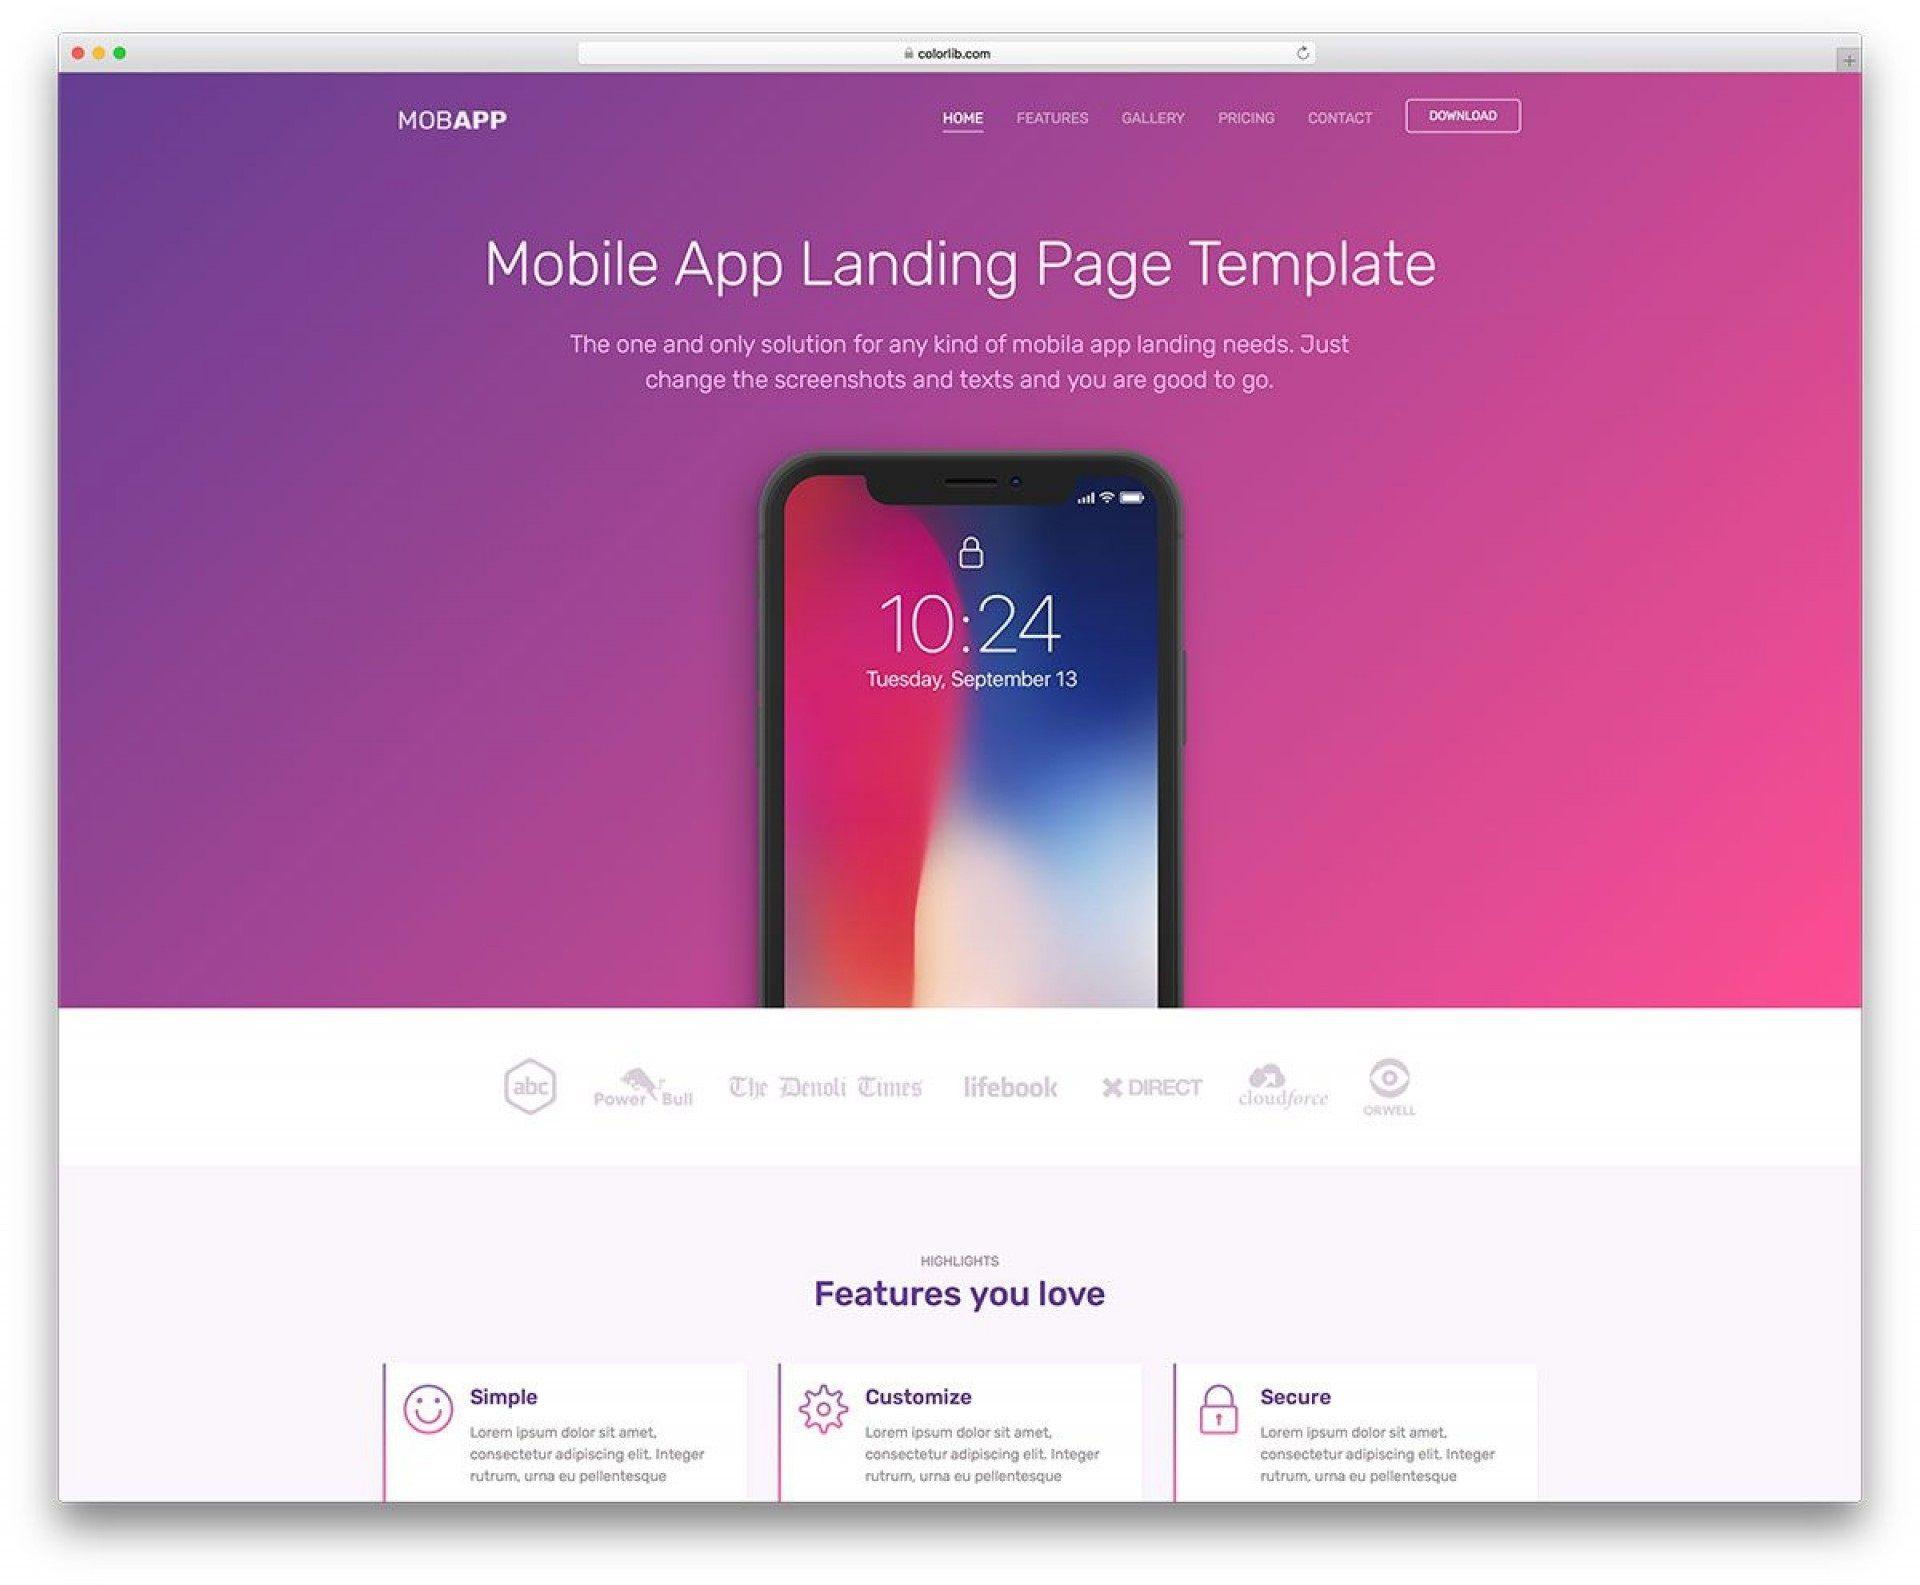 009 Unforgettable Csvape Esponsive Mobile App Landing Page Html Template Free Download Design  Csvape-responsive-mobile-app-landing-page-html-template1920